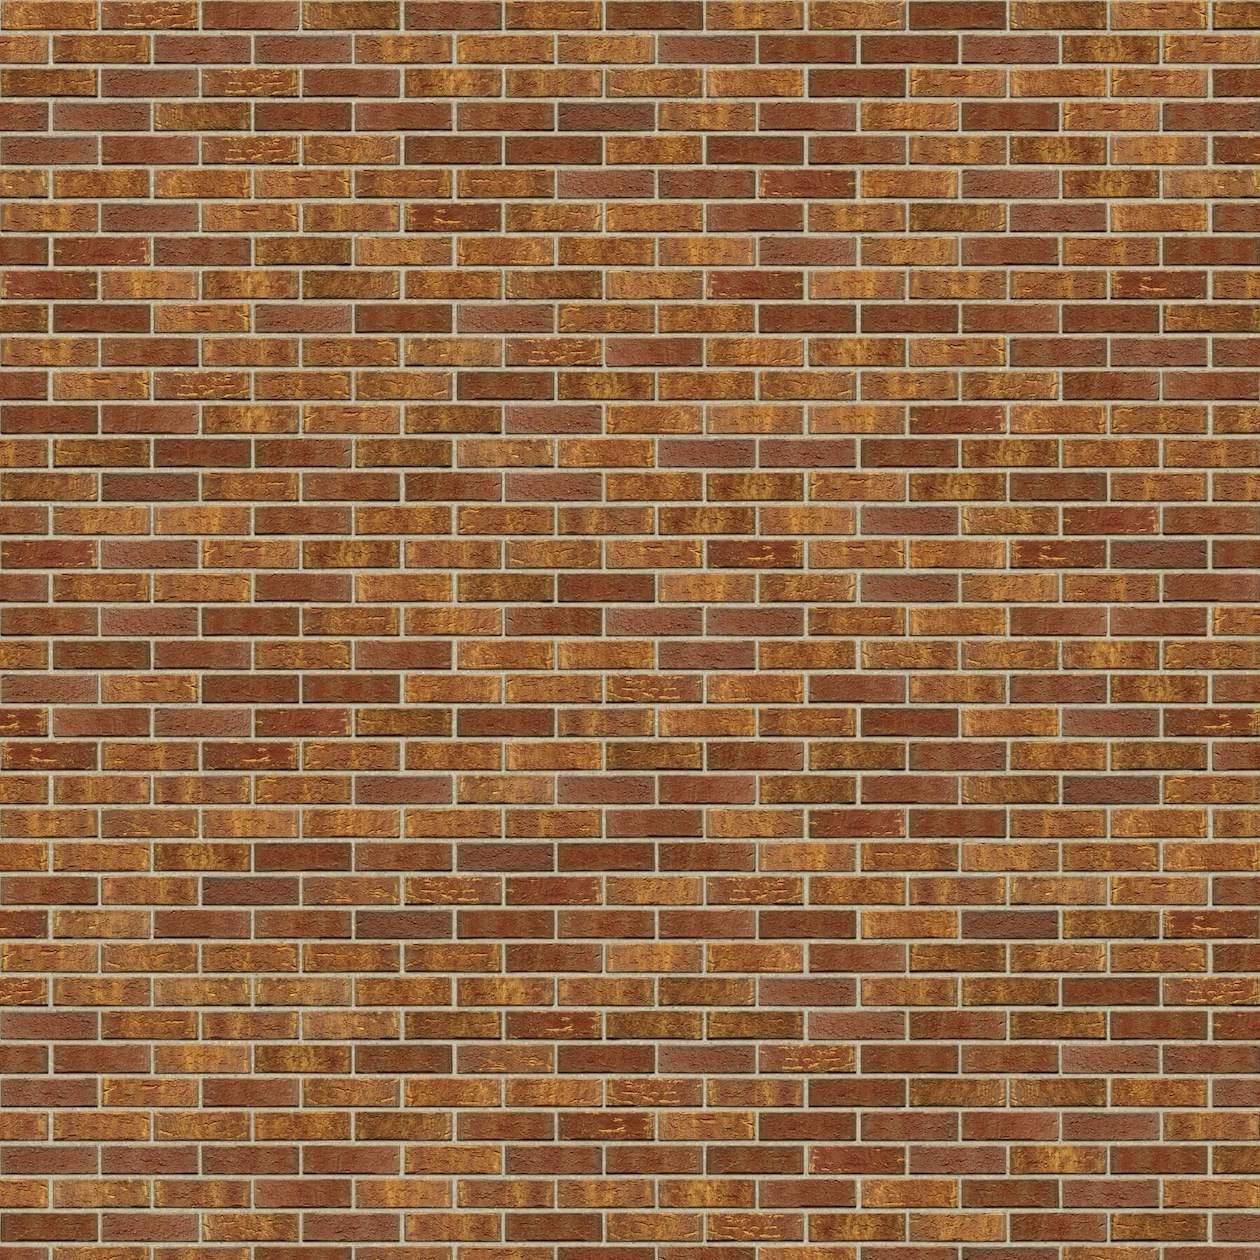 Puna-cigla-FeldHaus-Klinker-brick-house-nf-k-686-Bez Fuga